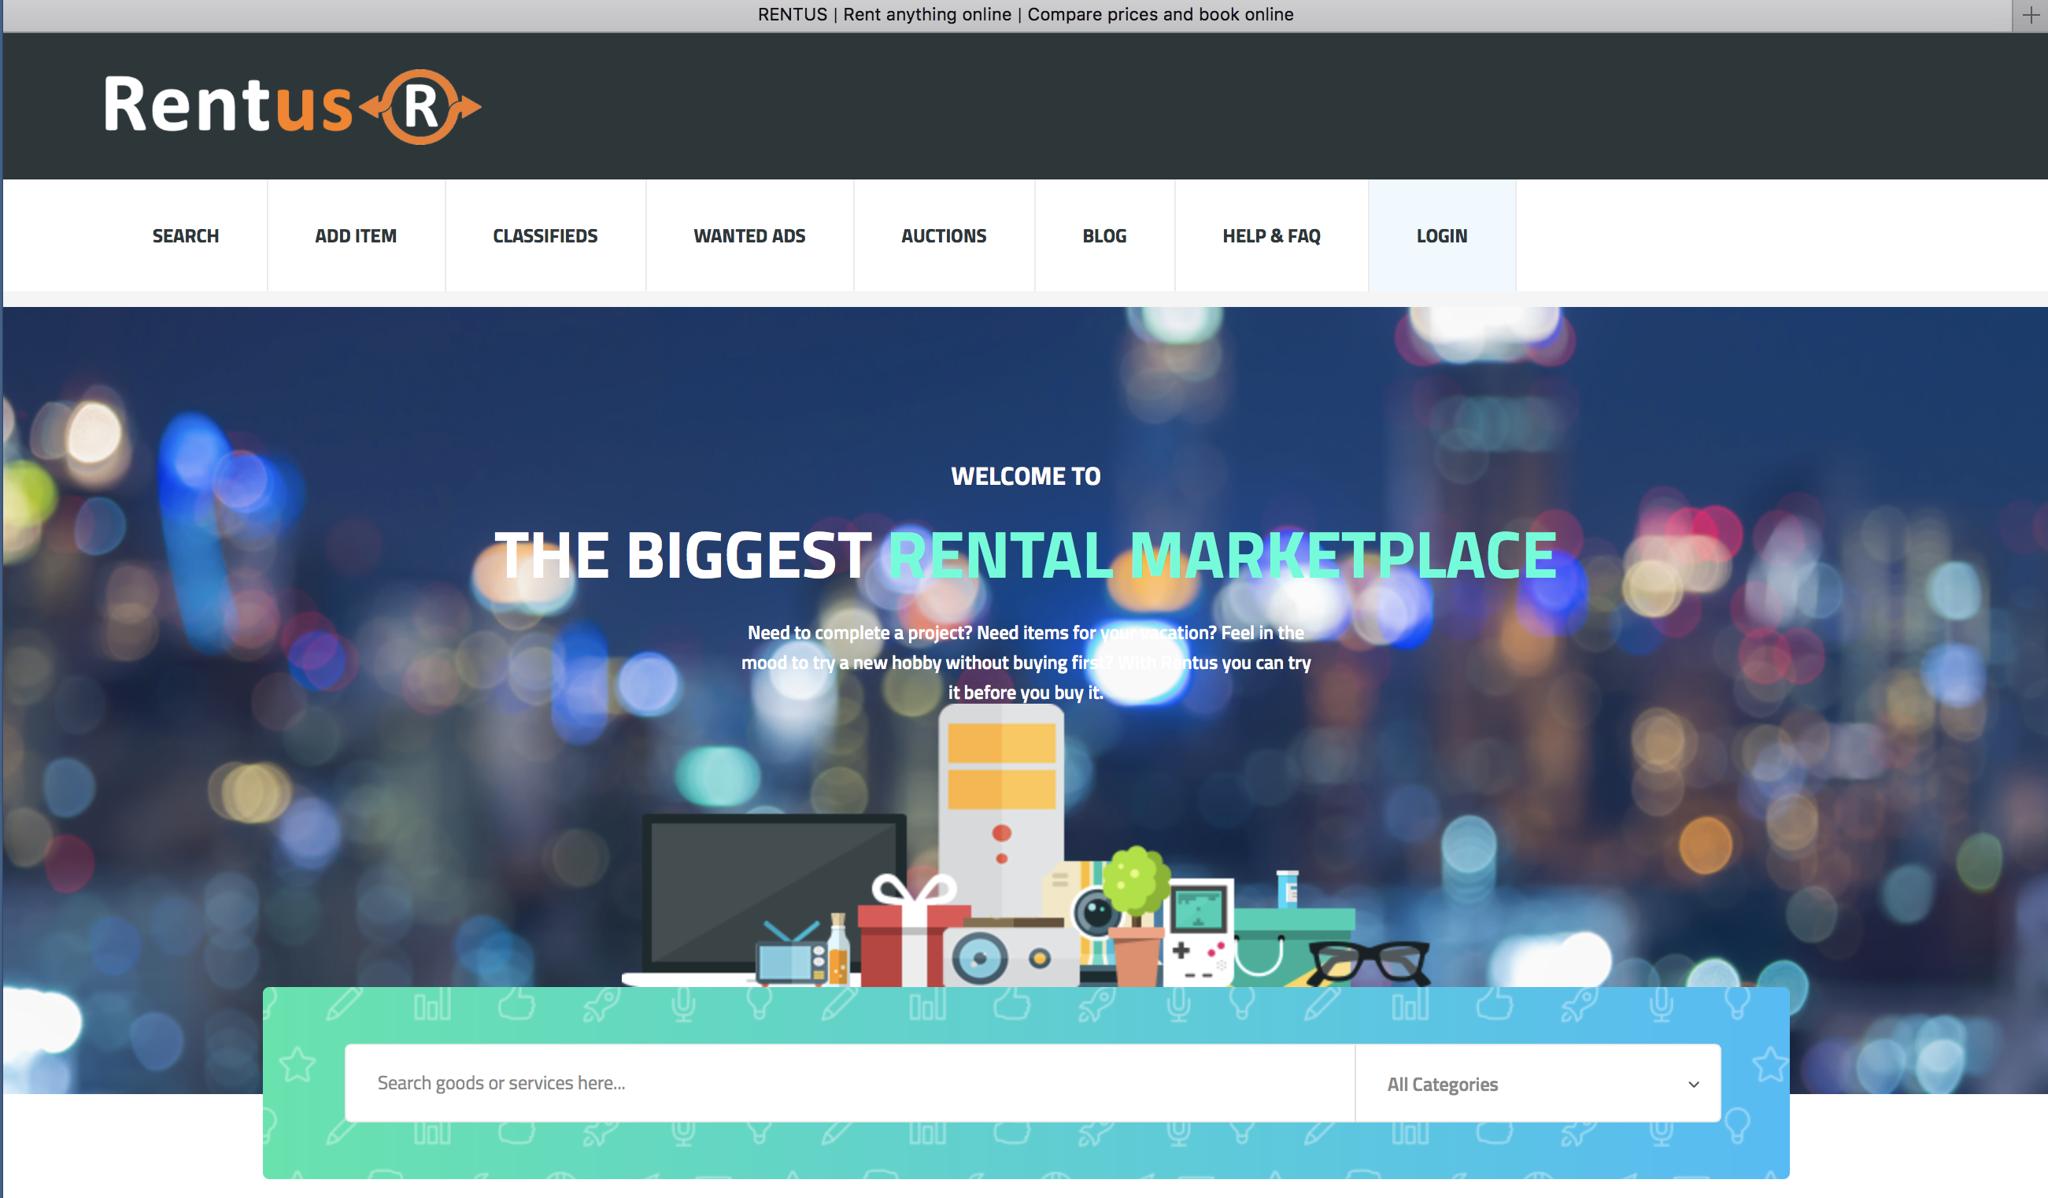 Rentus.com Version 2.0 - August 2017.png